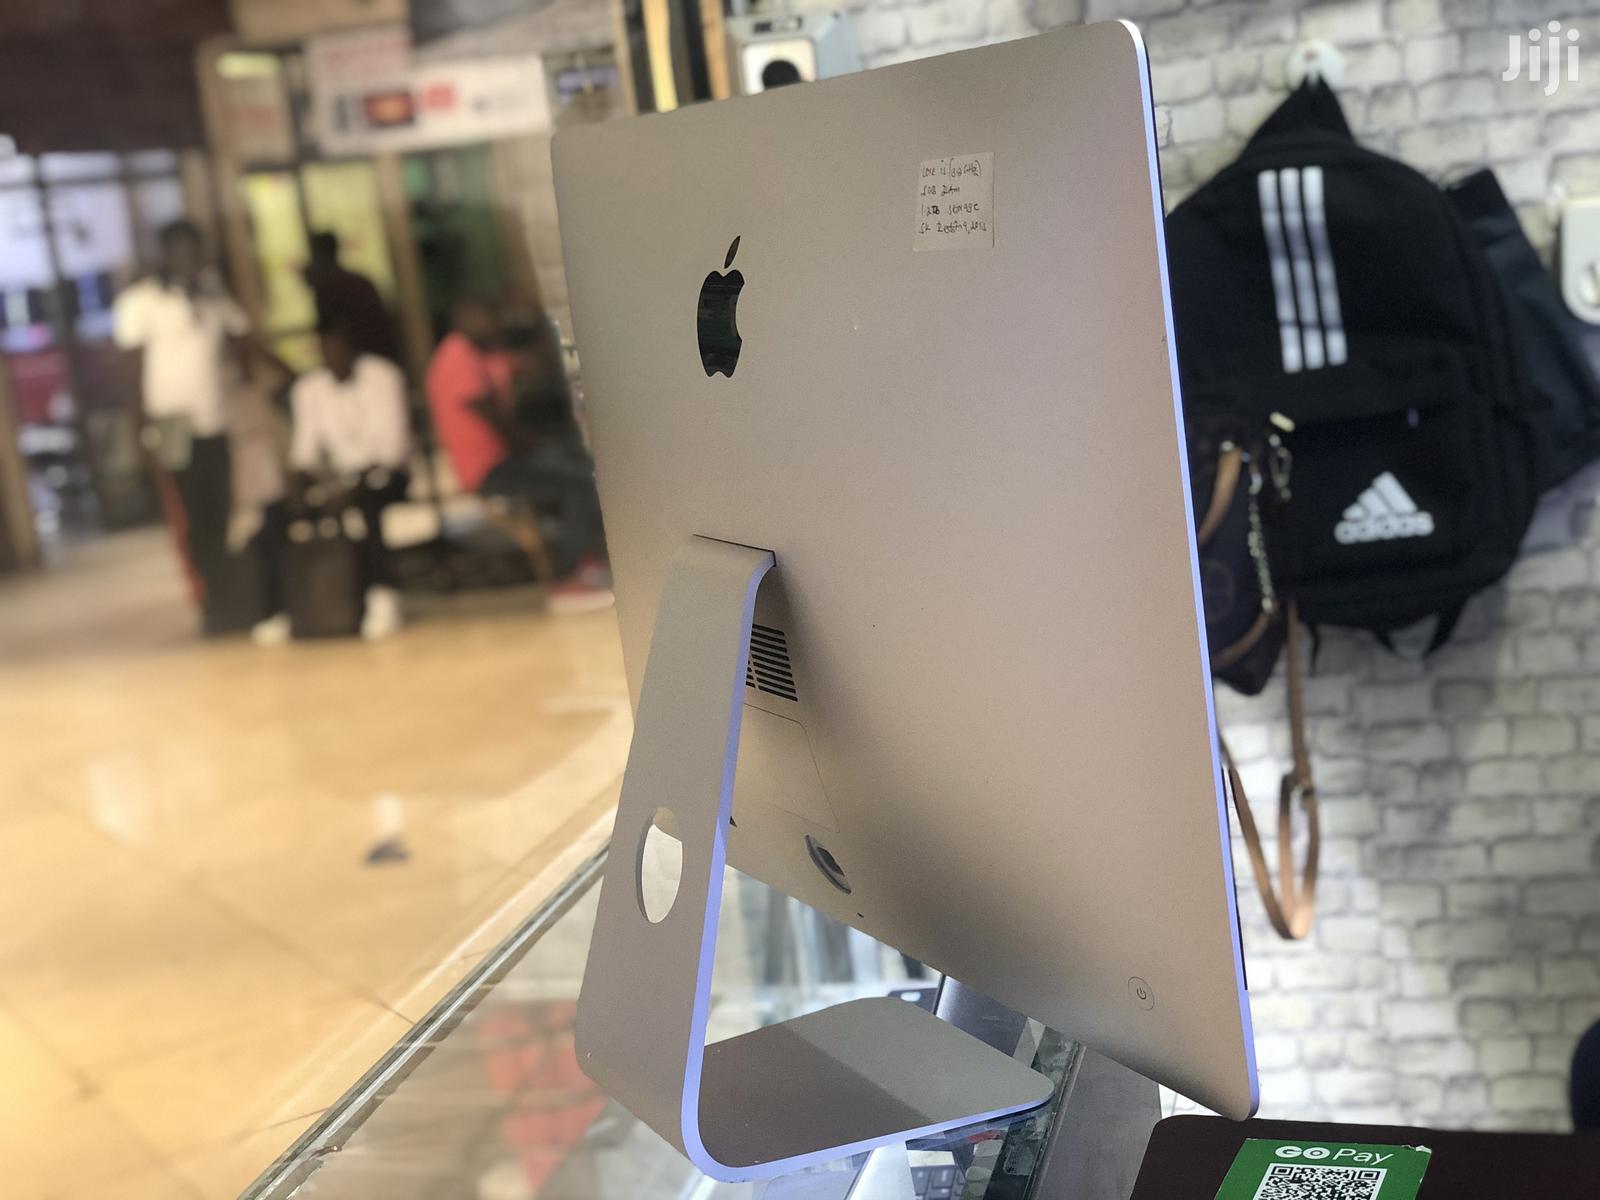 New Desktop Computer Apple iMac 8GB Intel Core i5 HDD 1T   Laptops & Computers for sale in Kampala, Central Region, Uganda